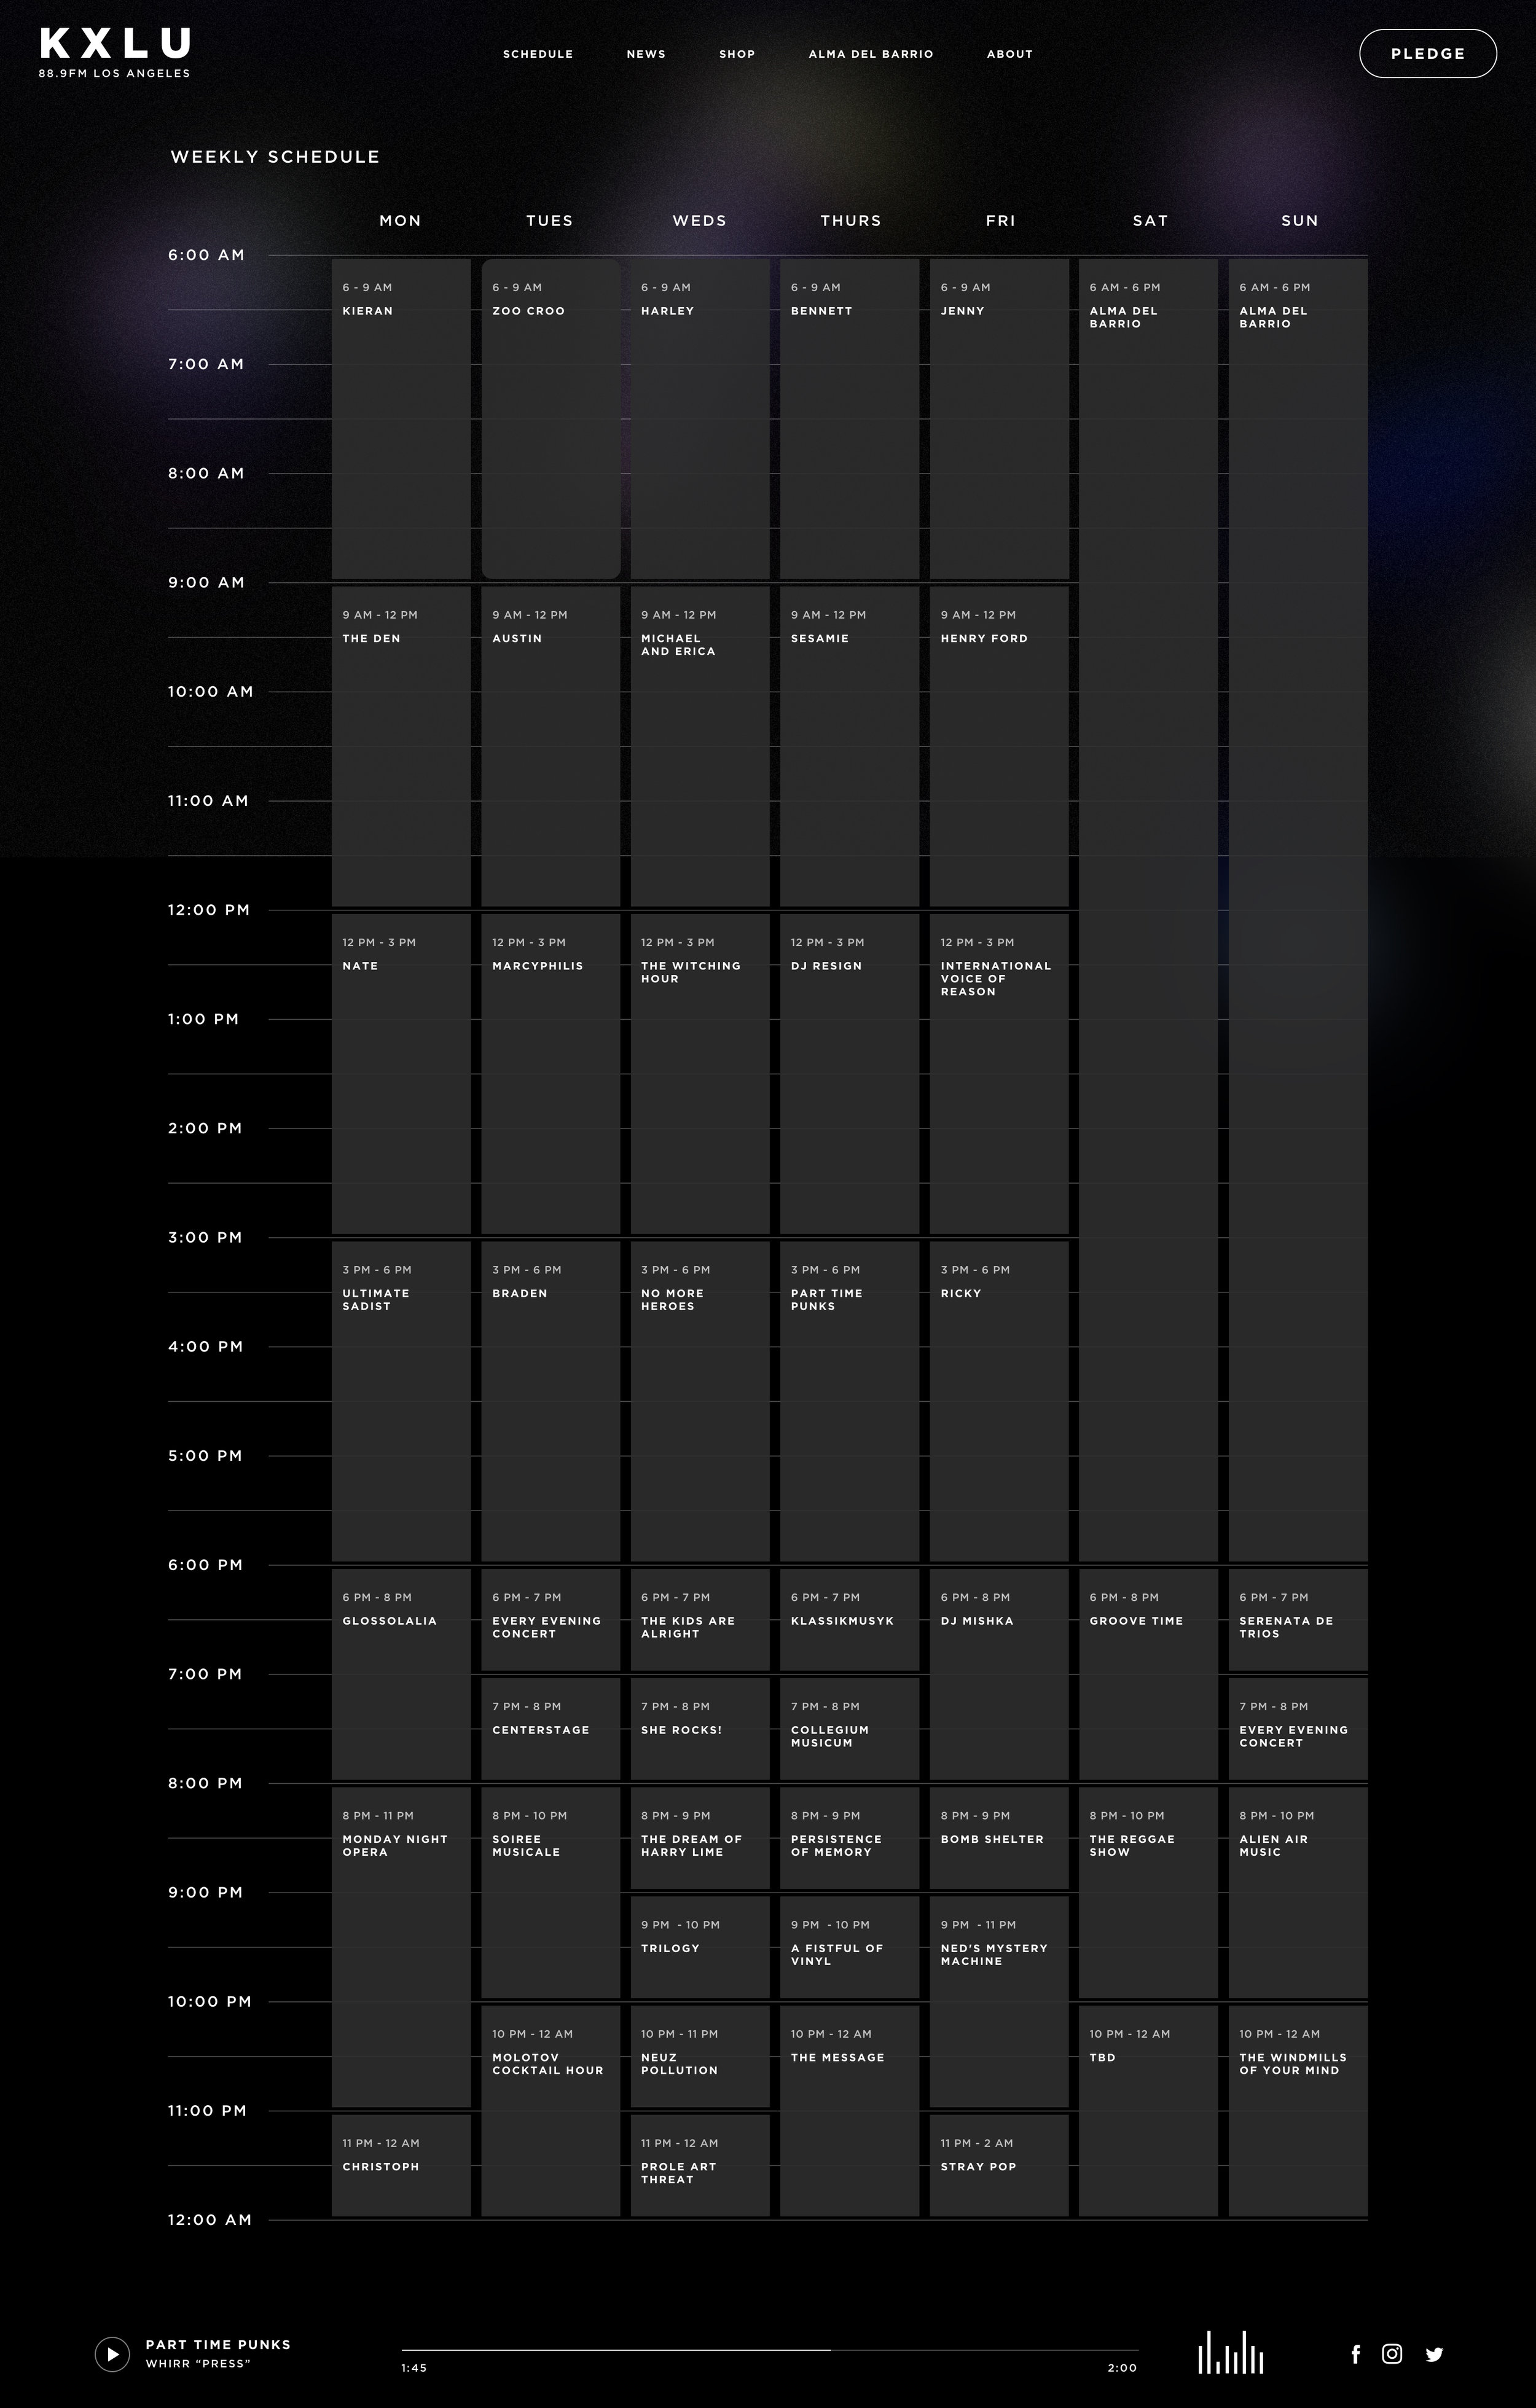 julianlozano_kxlu_schedule.jpg